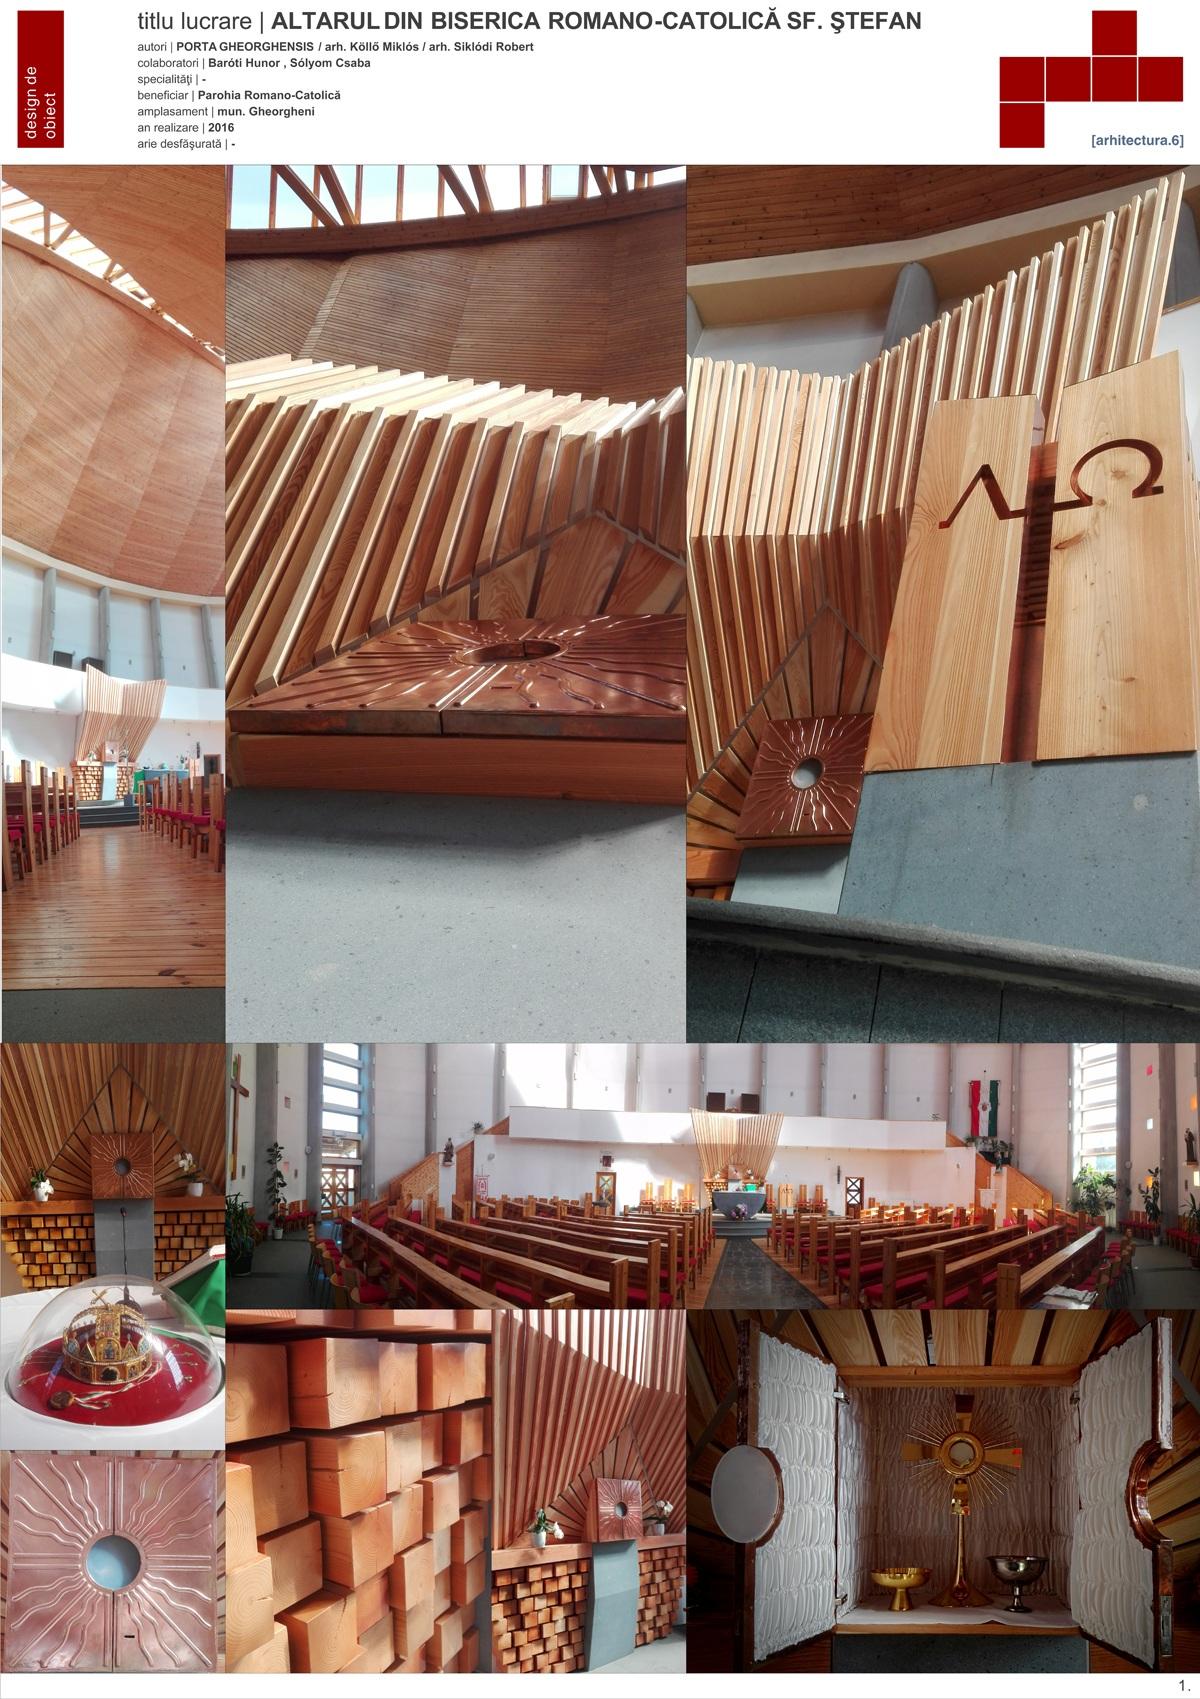 17_Altar Sf. Stefan 1